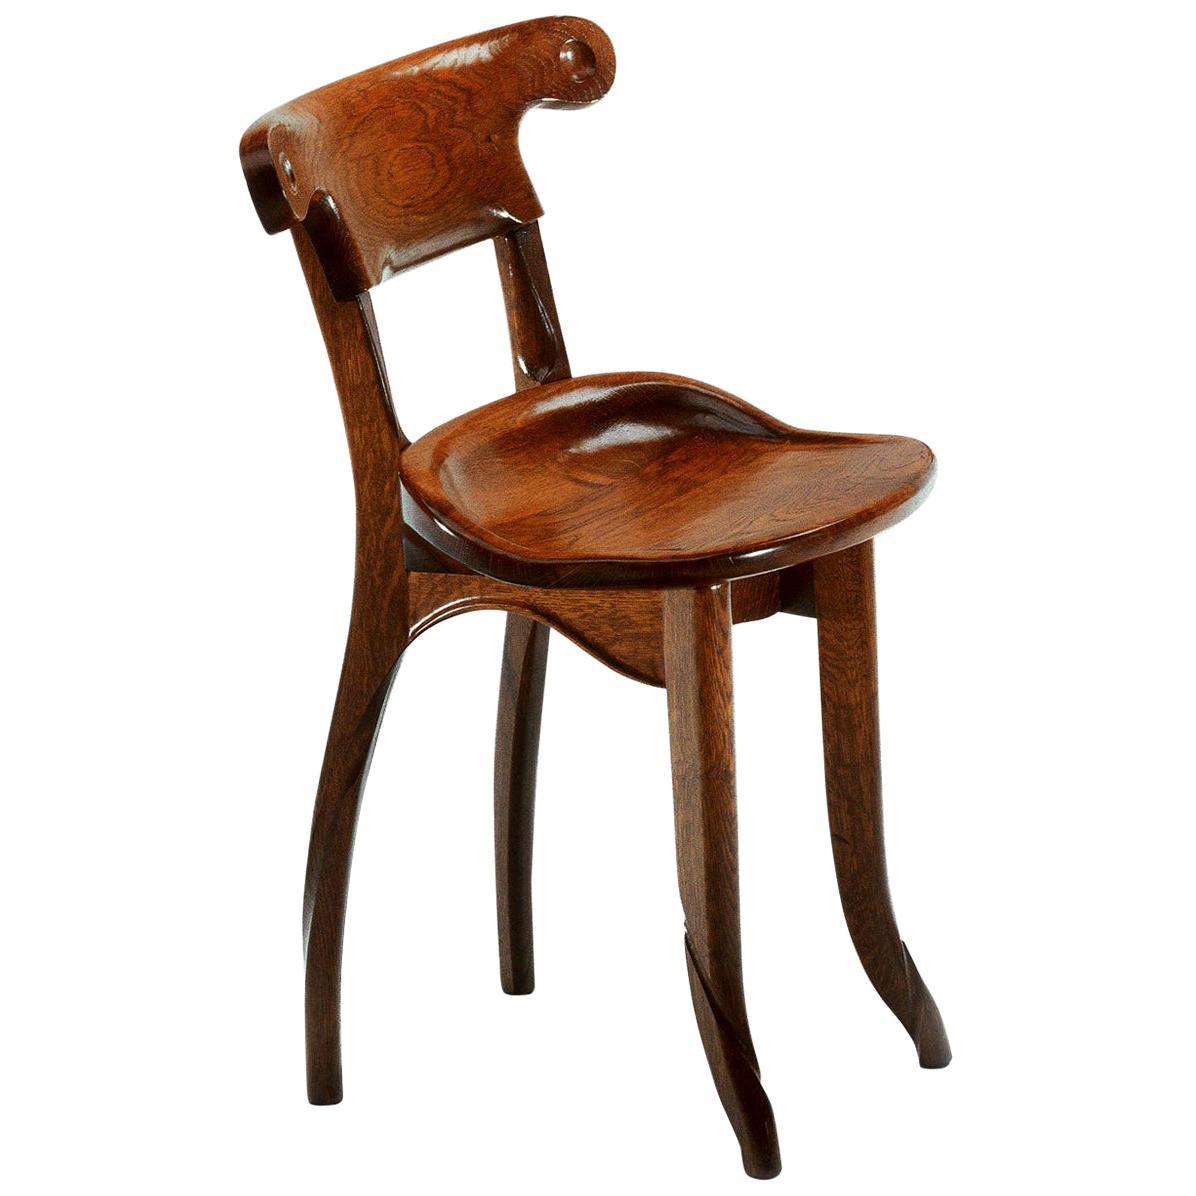 Antoni Gaudi, Jugendstil, Solid Oak Batllo Spanish Chairs